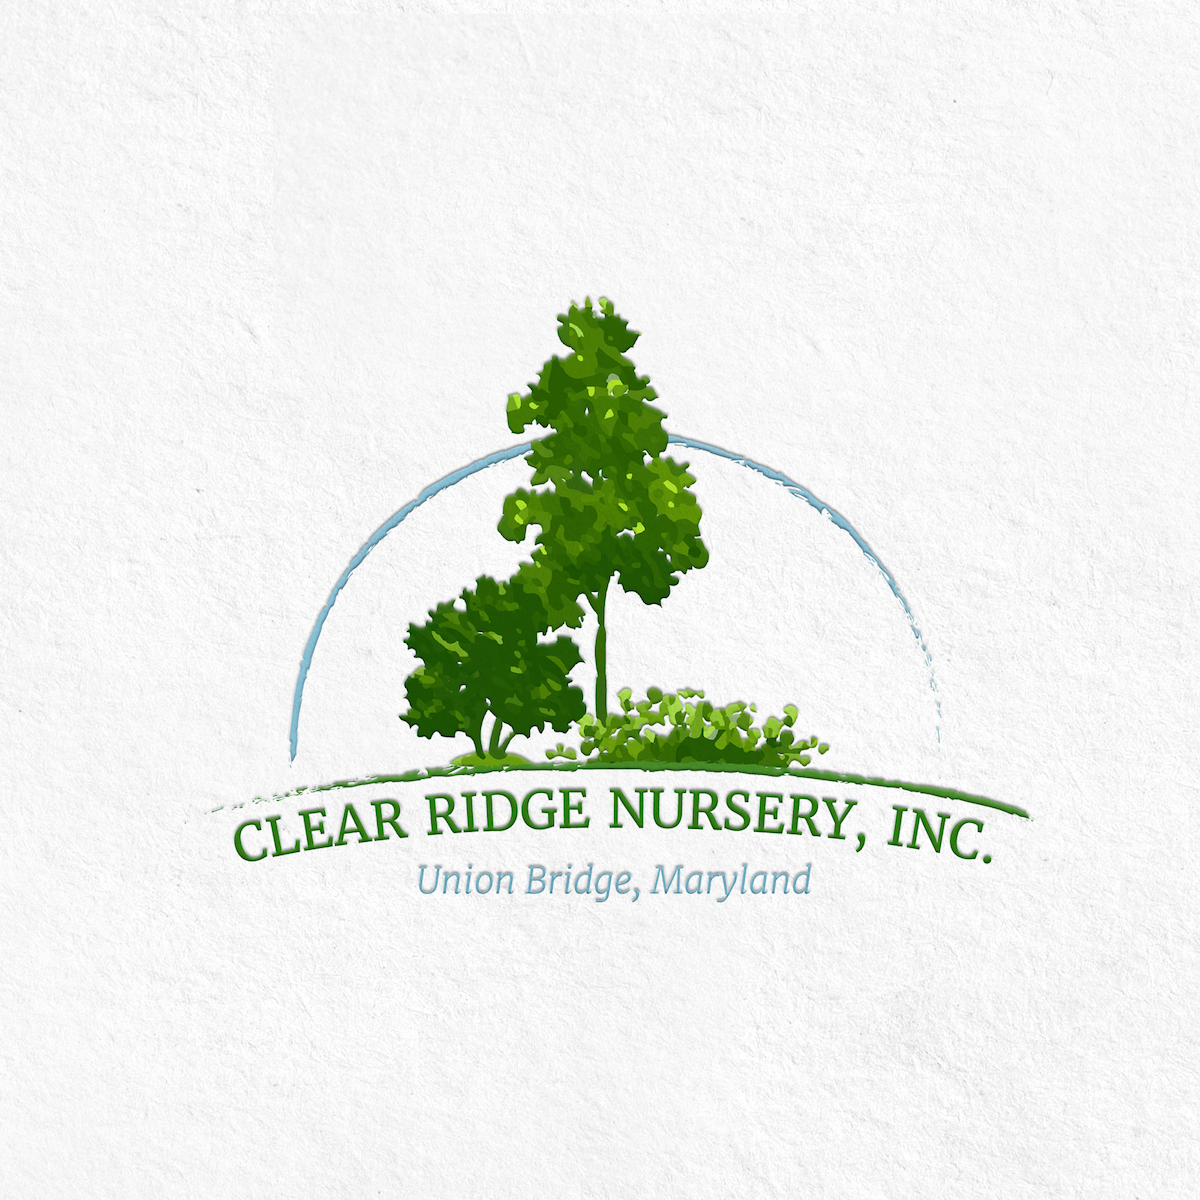 Tree Farm Logo Nursery Logo By All Ag Media Farm Logo Nursery Logo Design Farm Logo Design